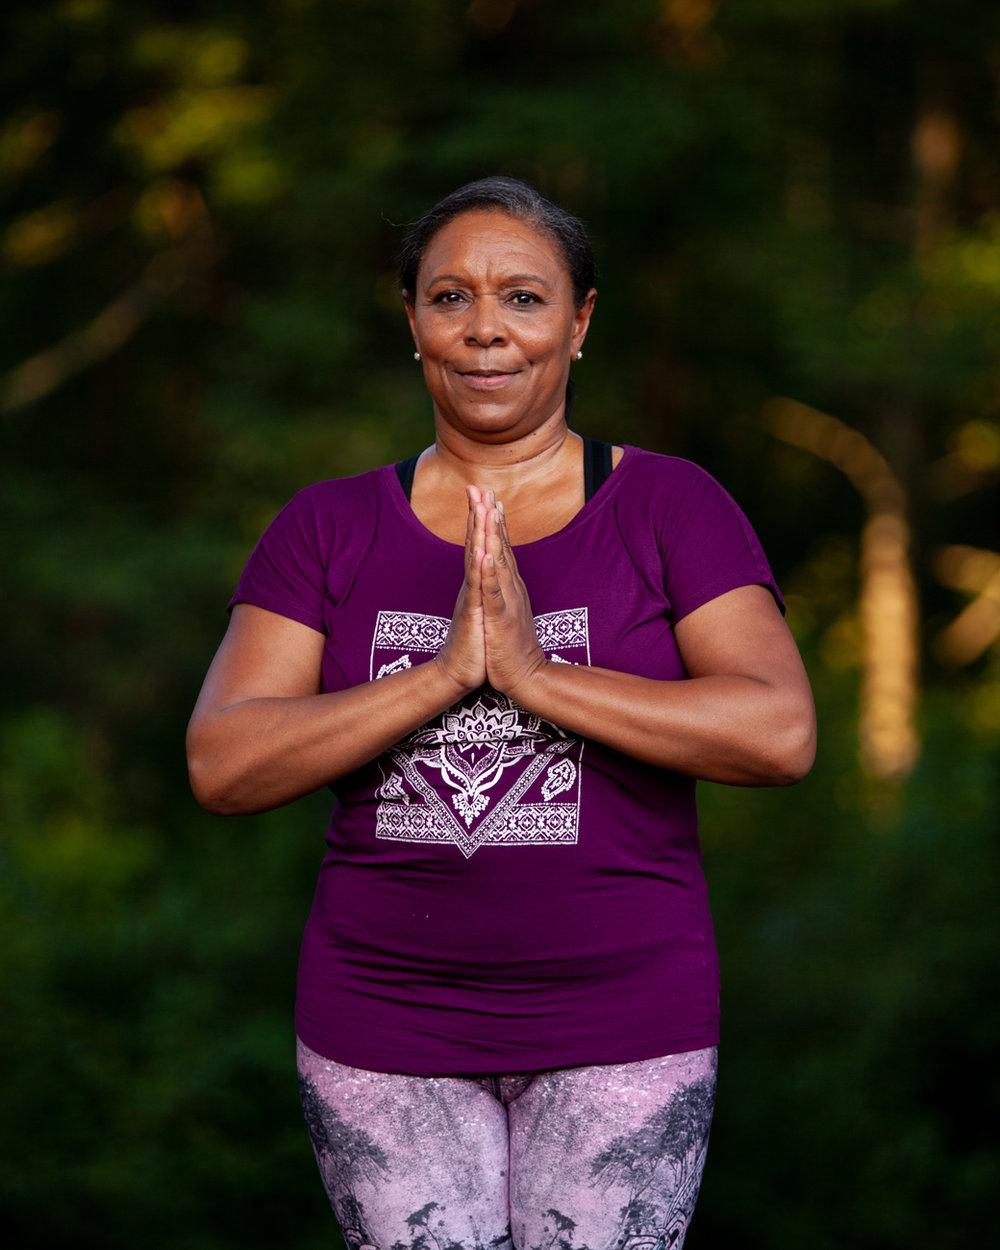 Rita Yoga Portraits_66.jpg